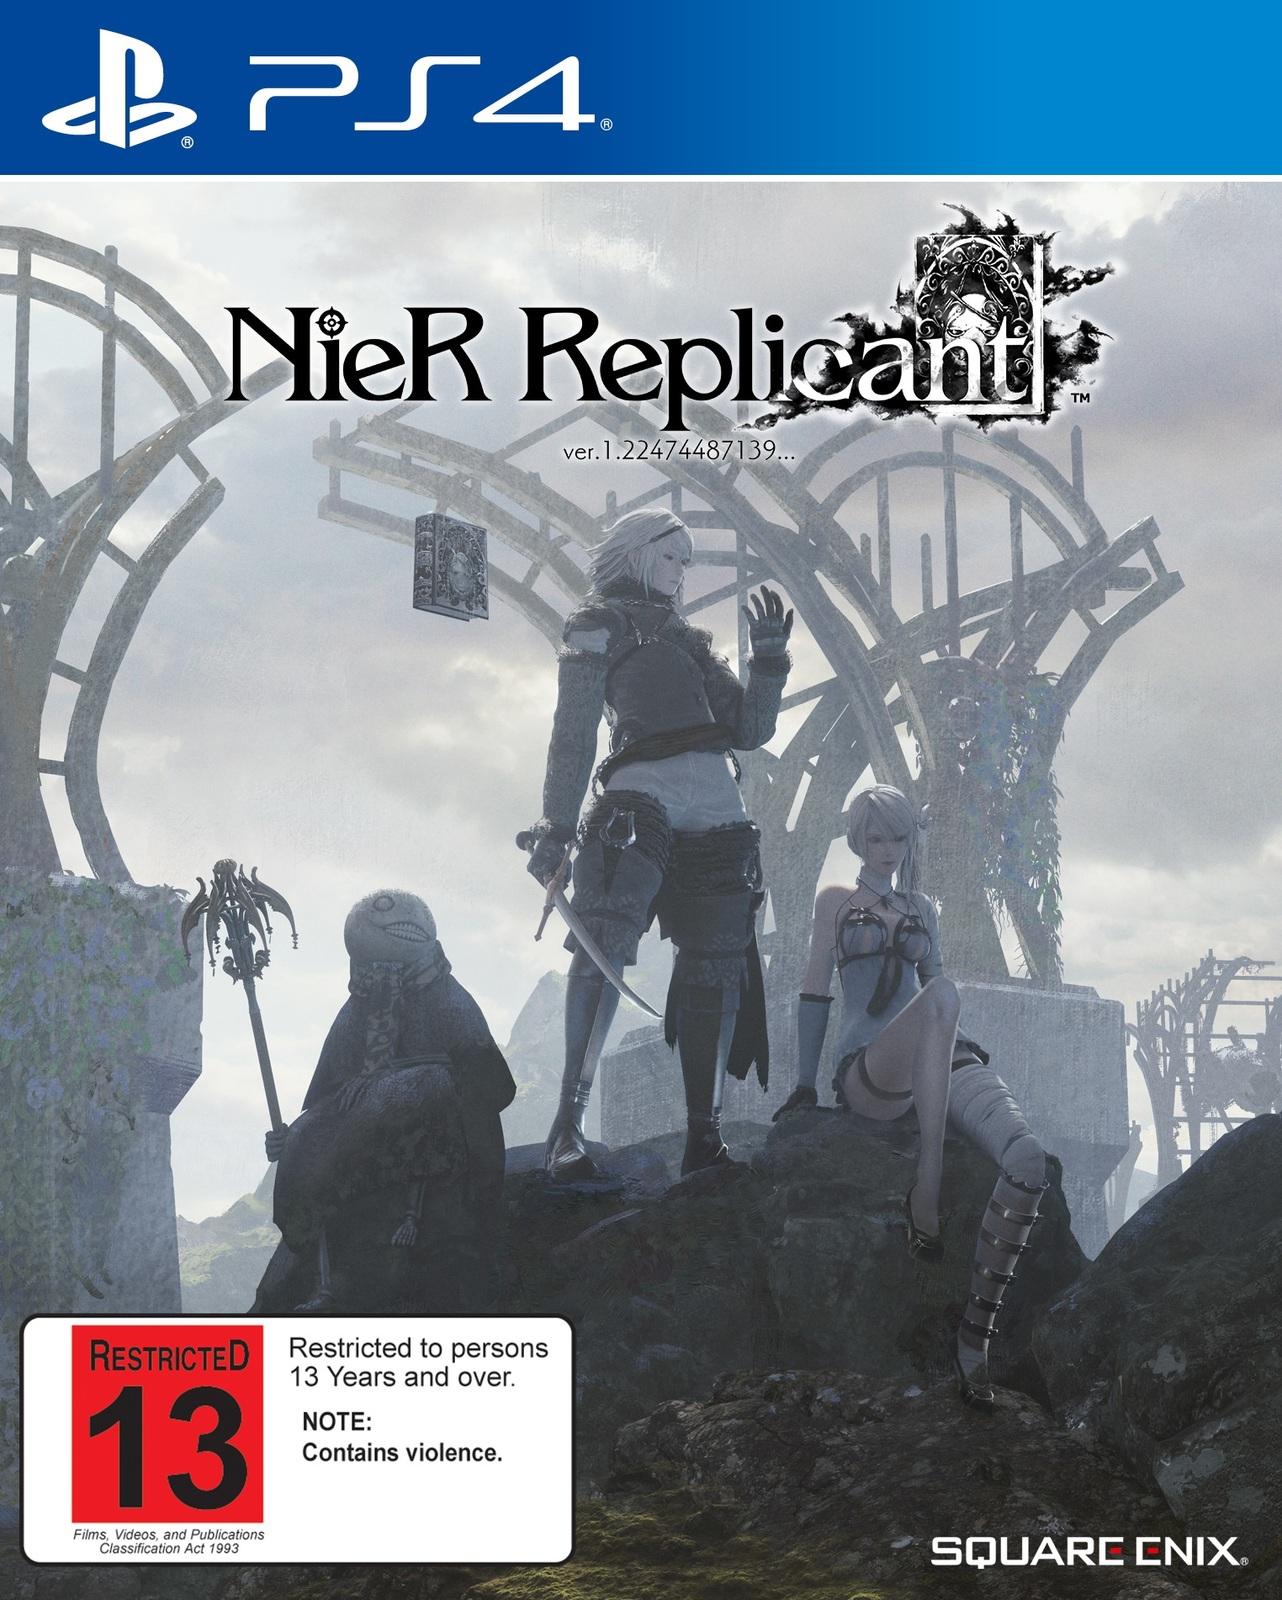 NieR Replicant ver.1.22474487139 screenshot